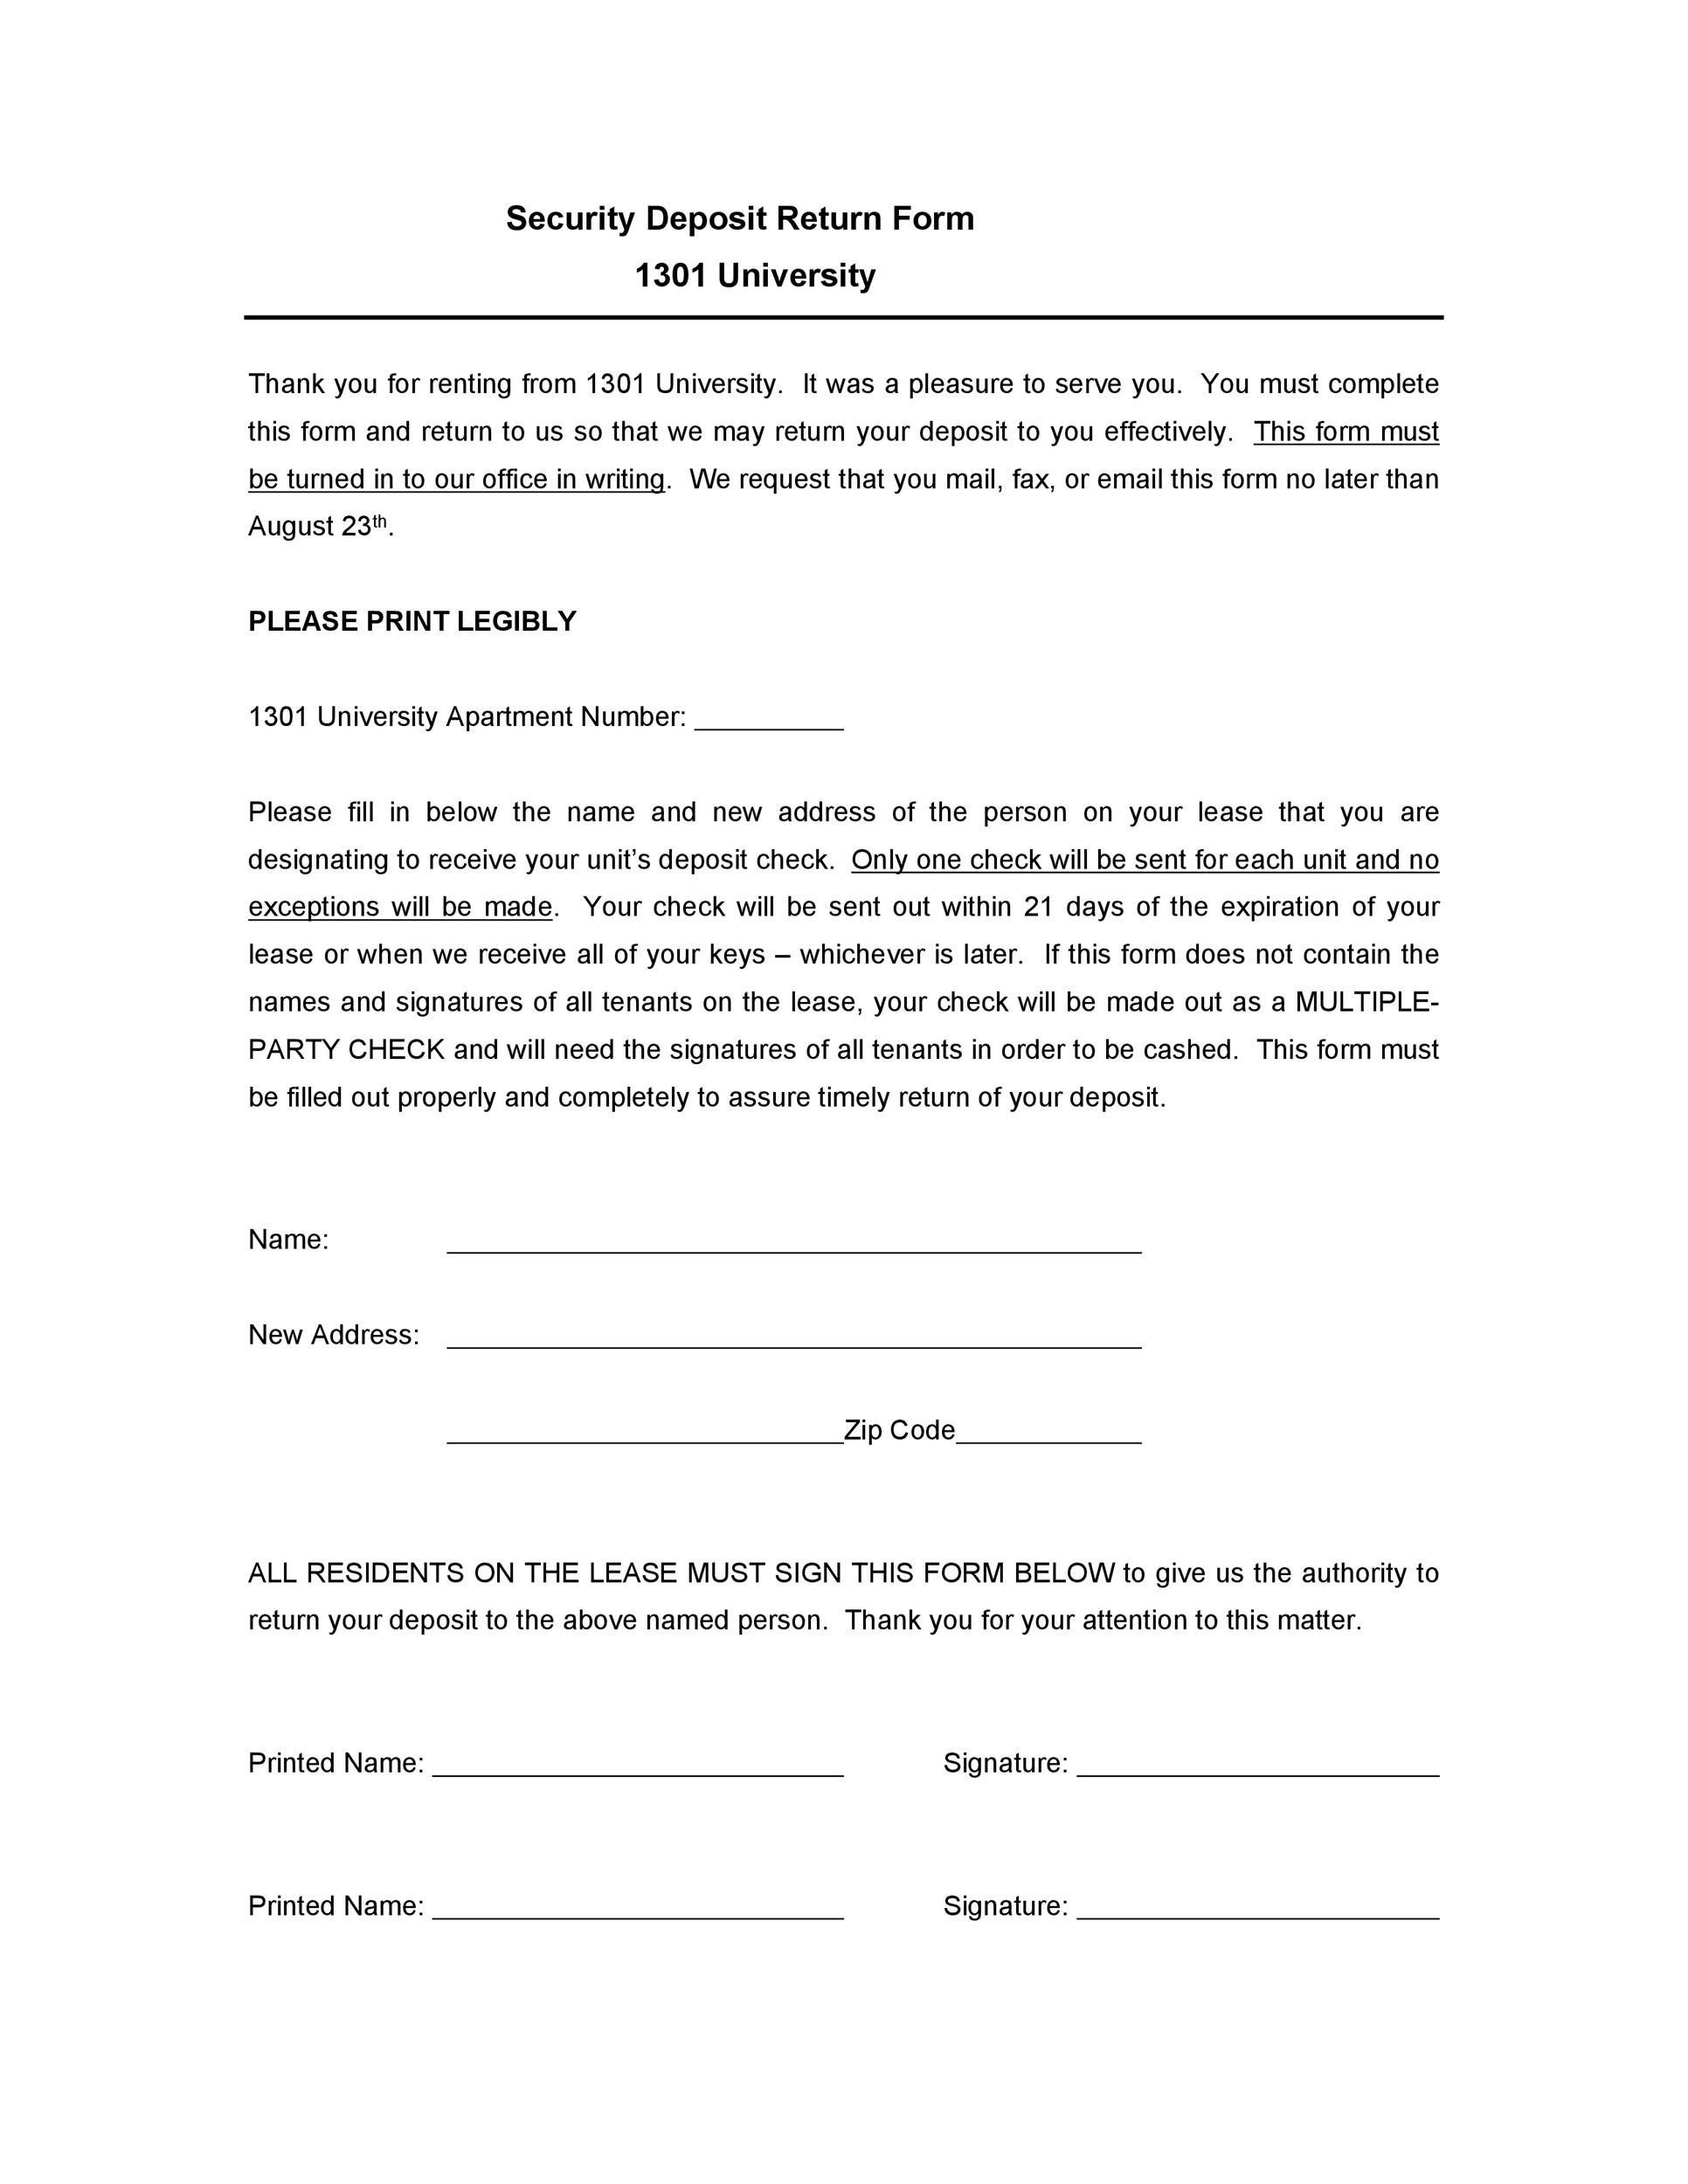 Free security deposit return letter 13